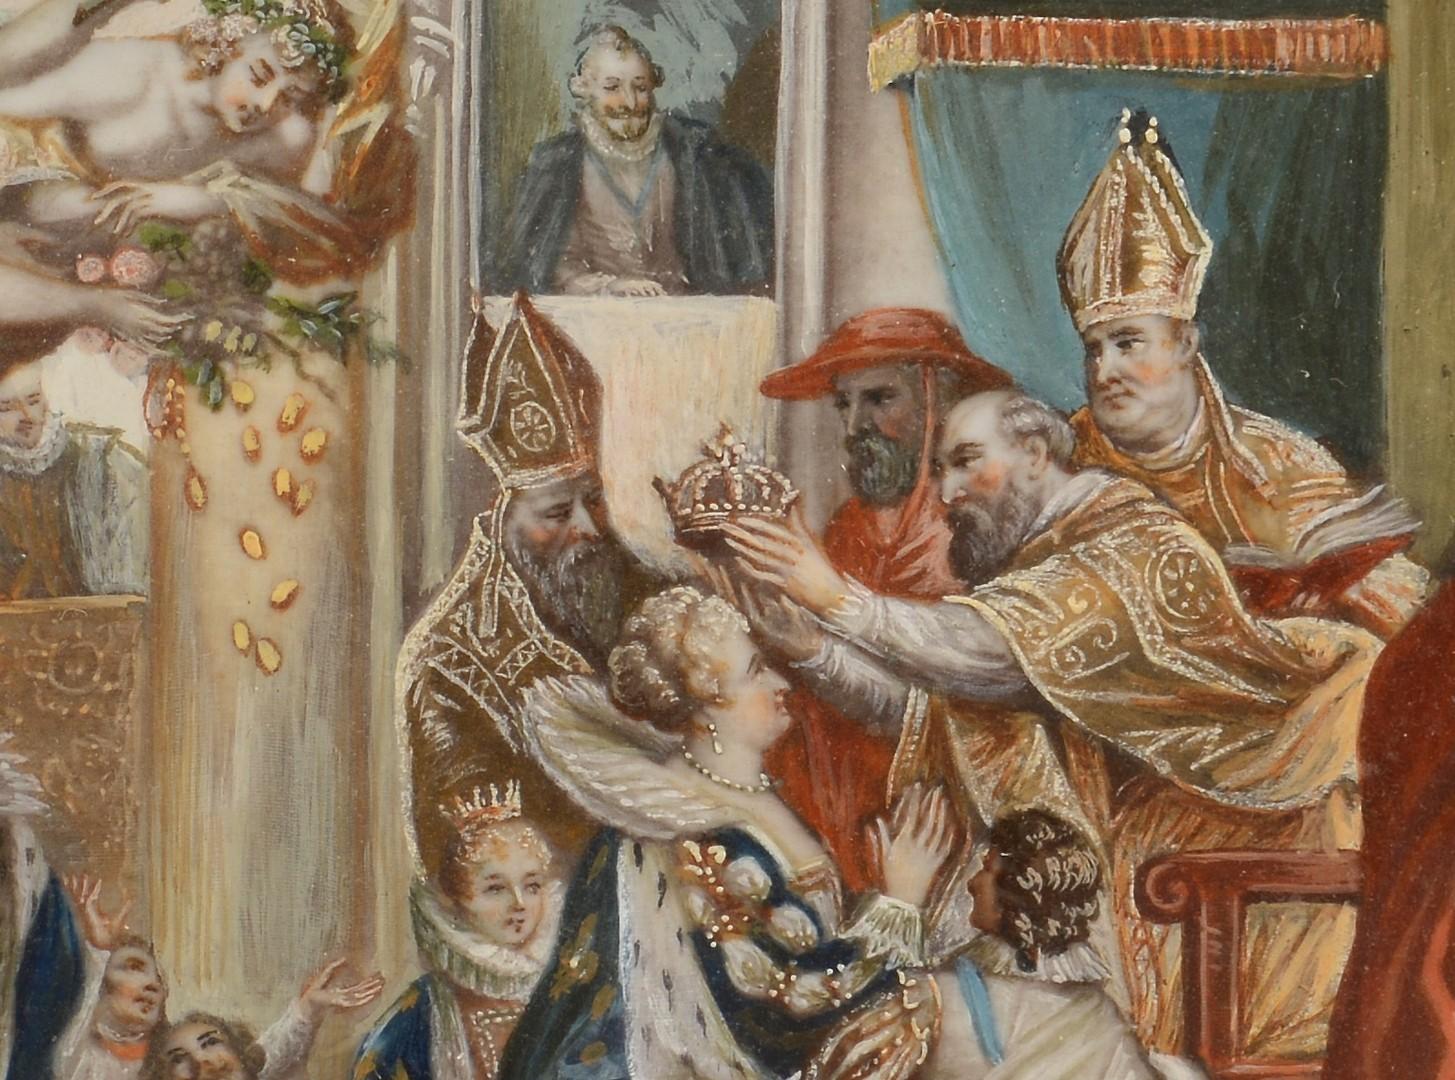 Lot 3832435: Miniature Coronation Painting, signed